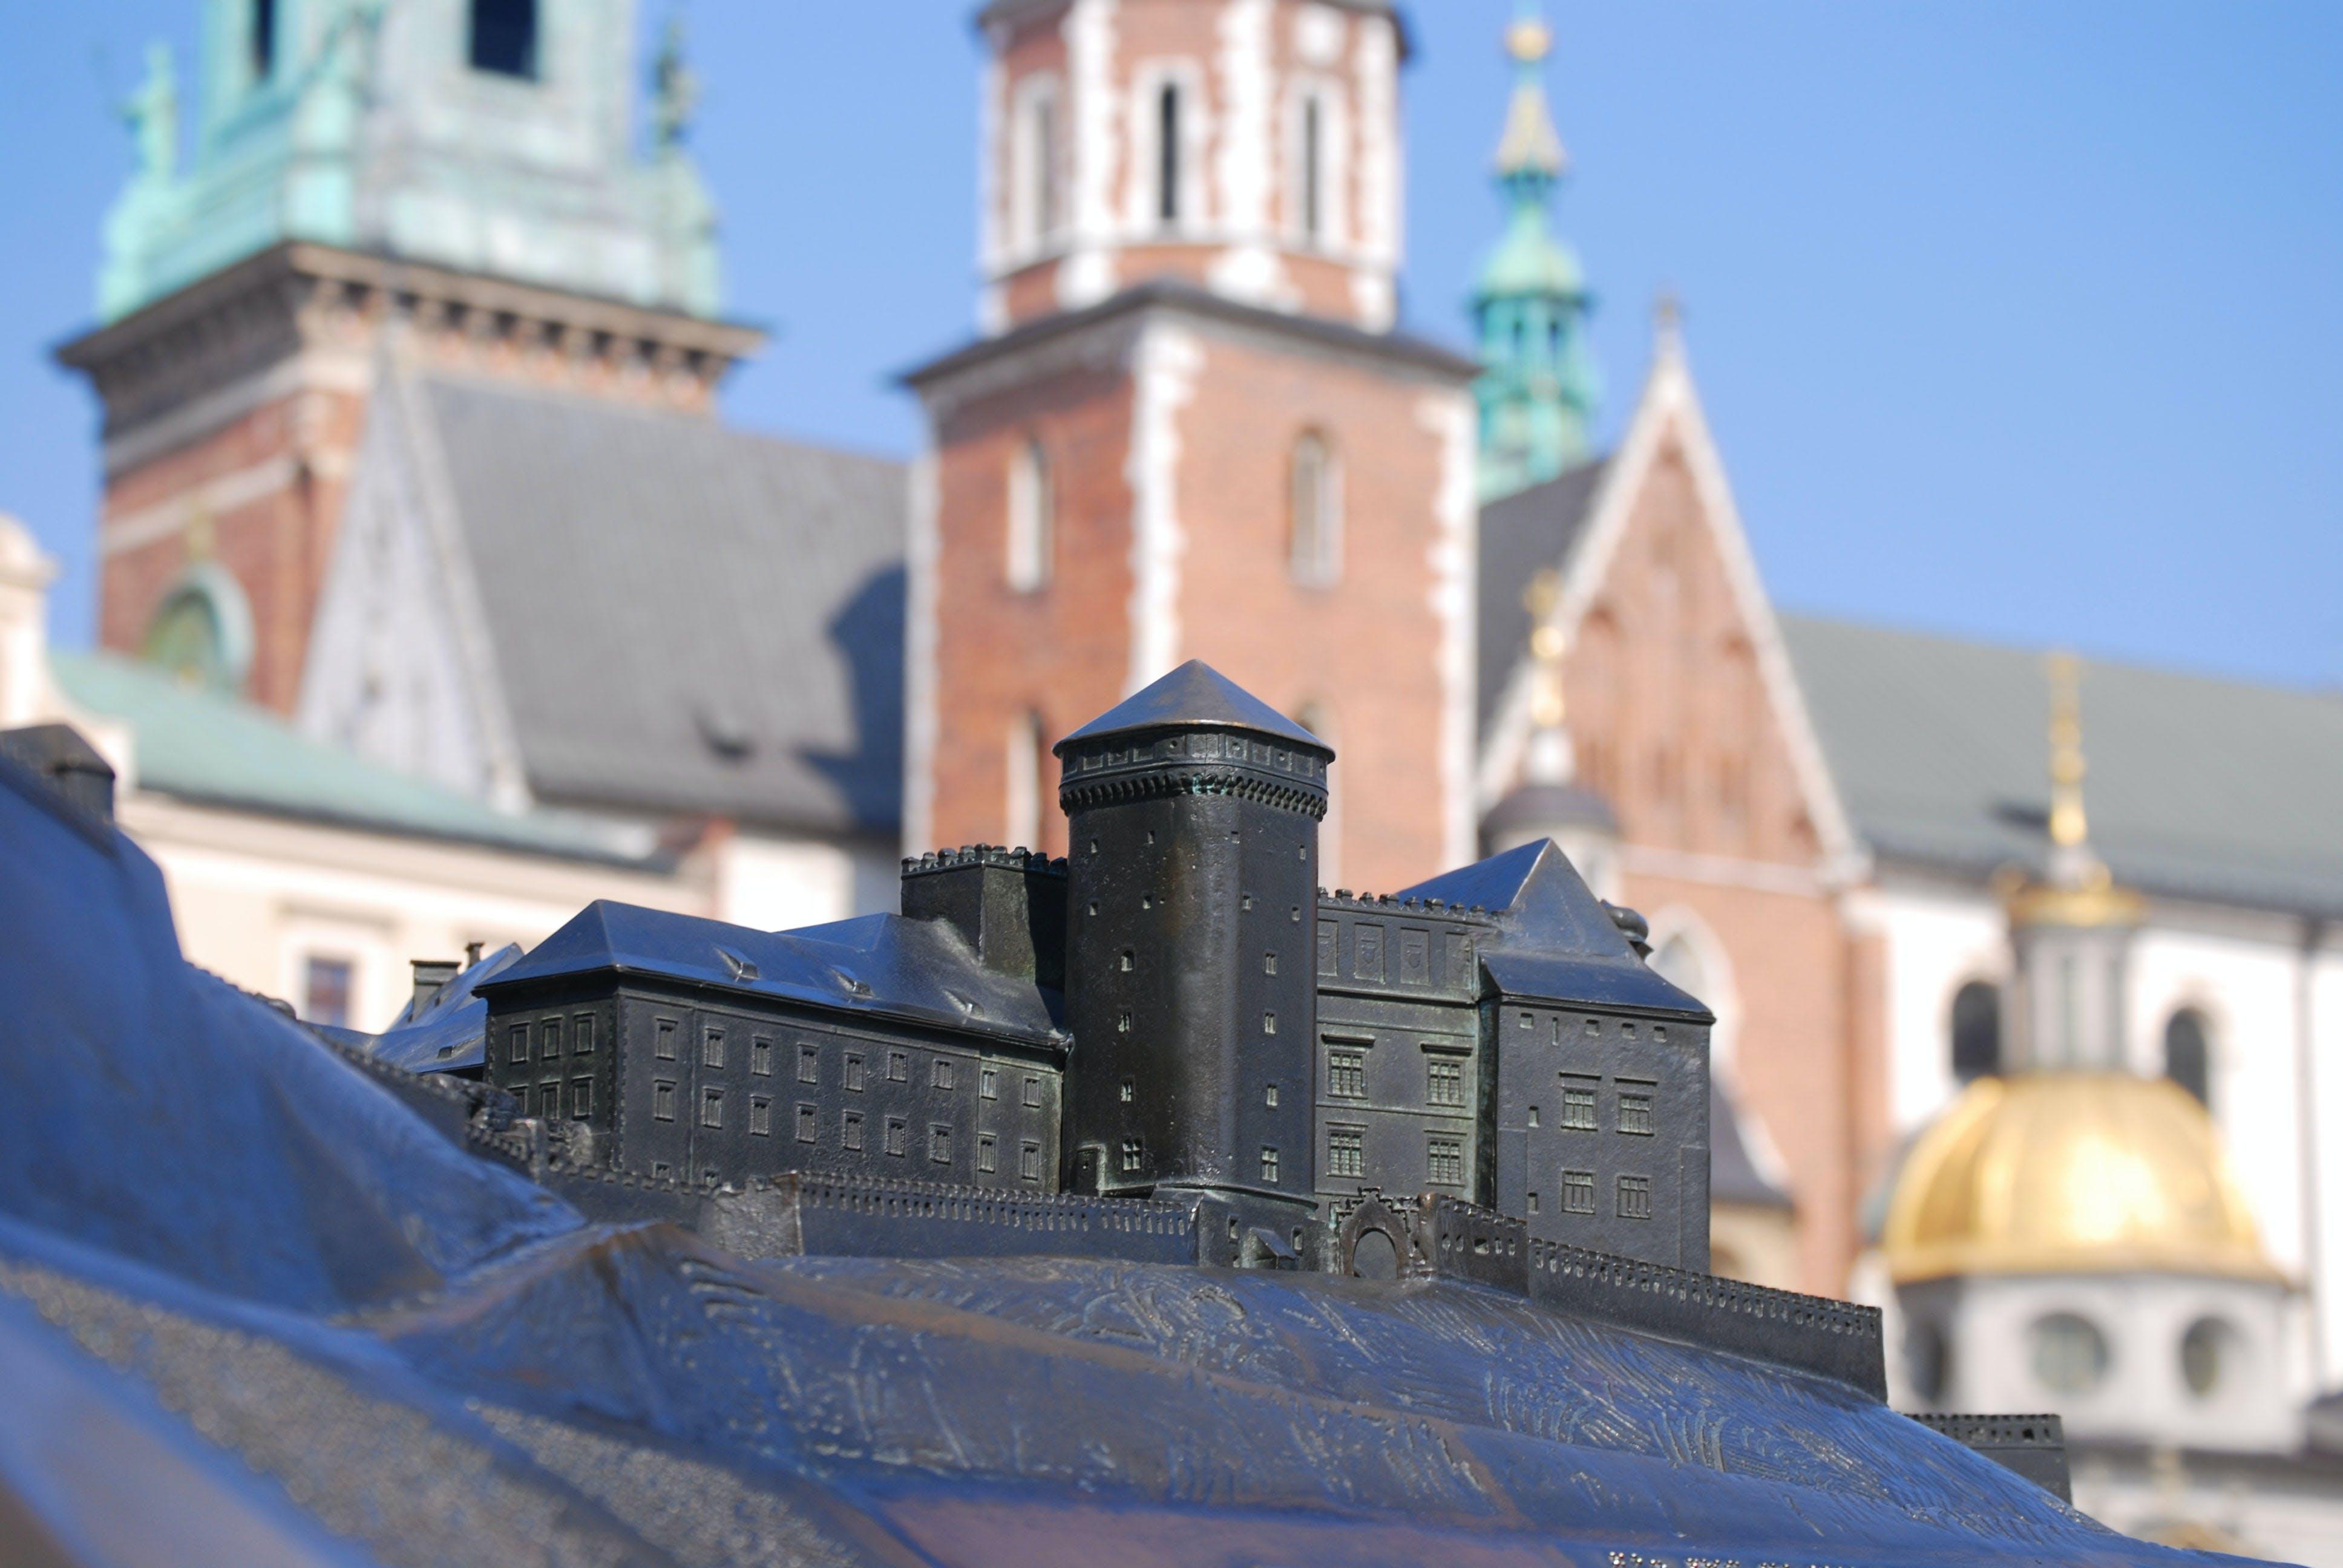 Black Building Miniature